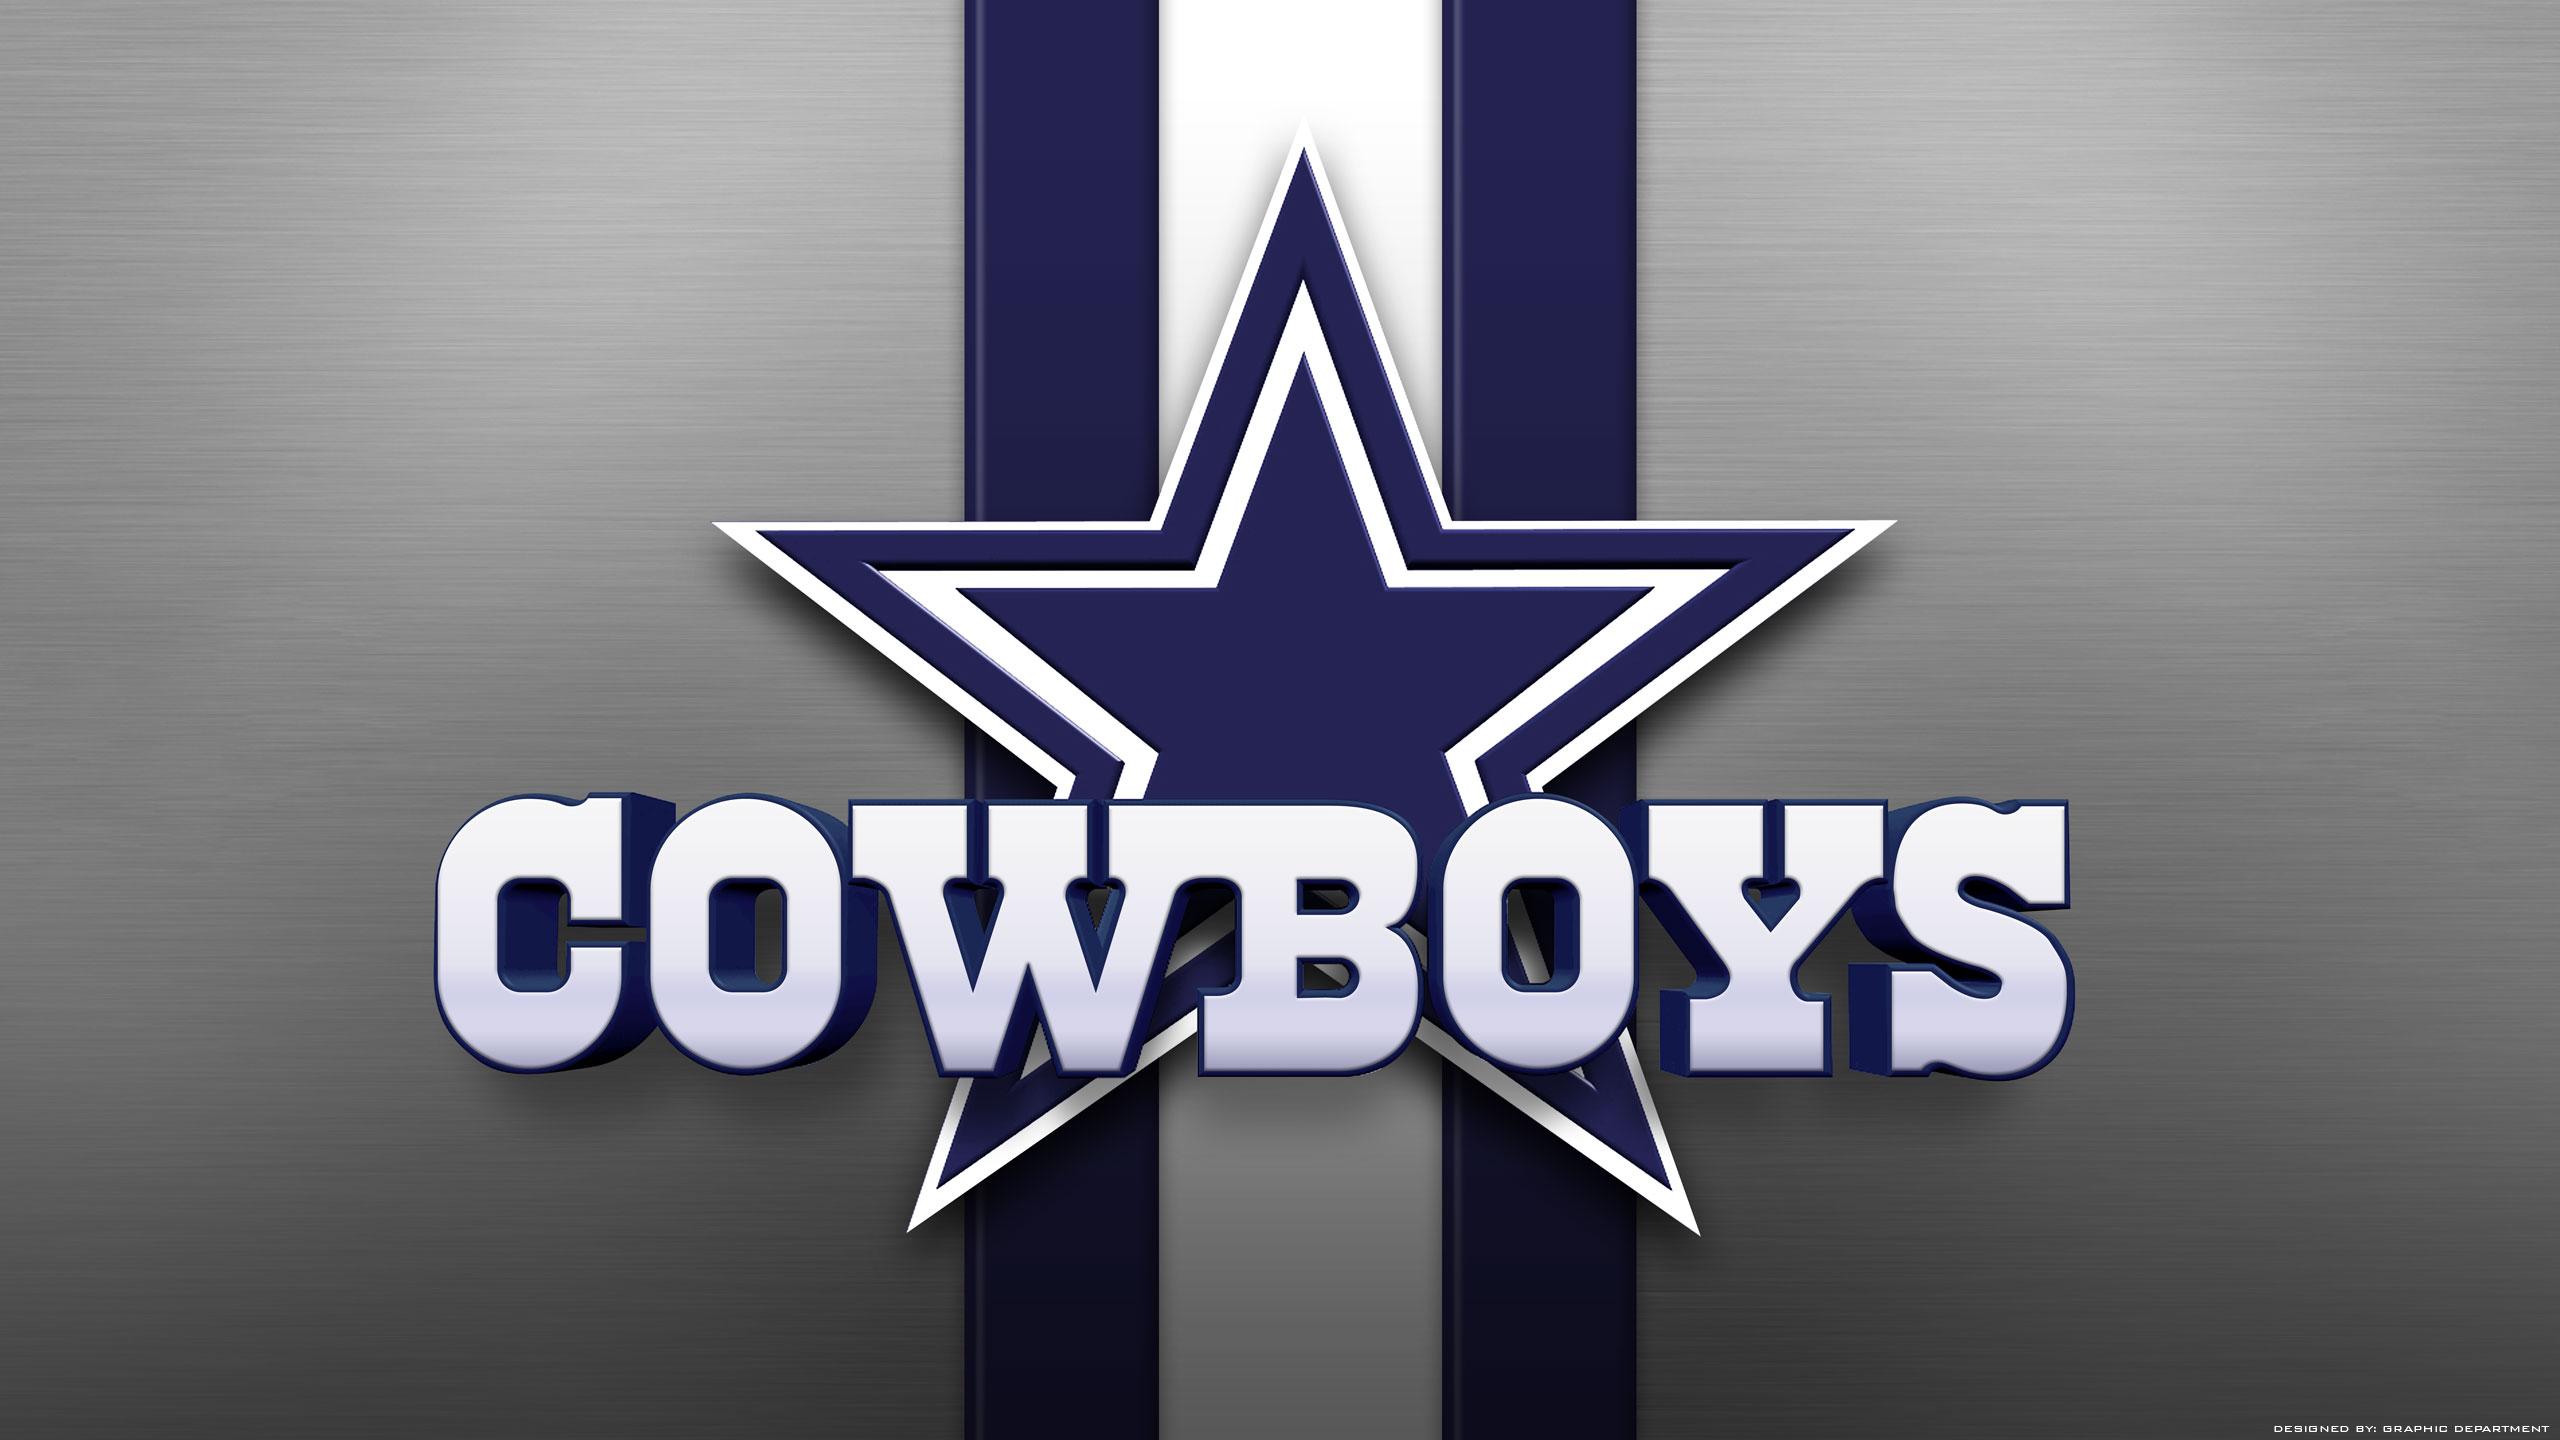 Pink Dallas Cowboys Logo Wallpaper for Pinterest 2560x1440